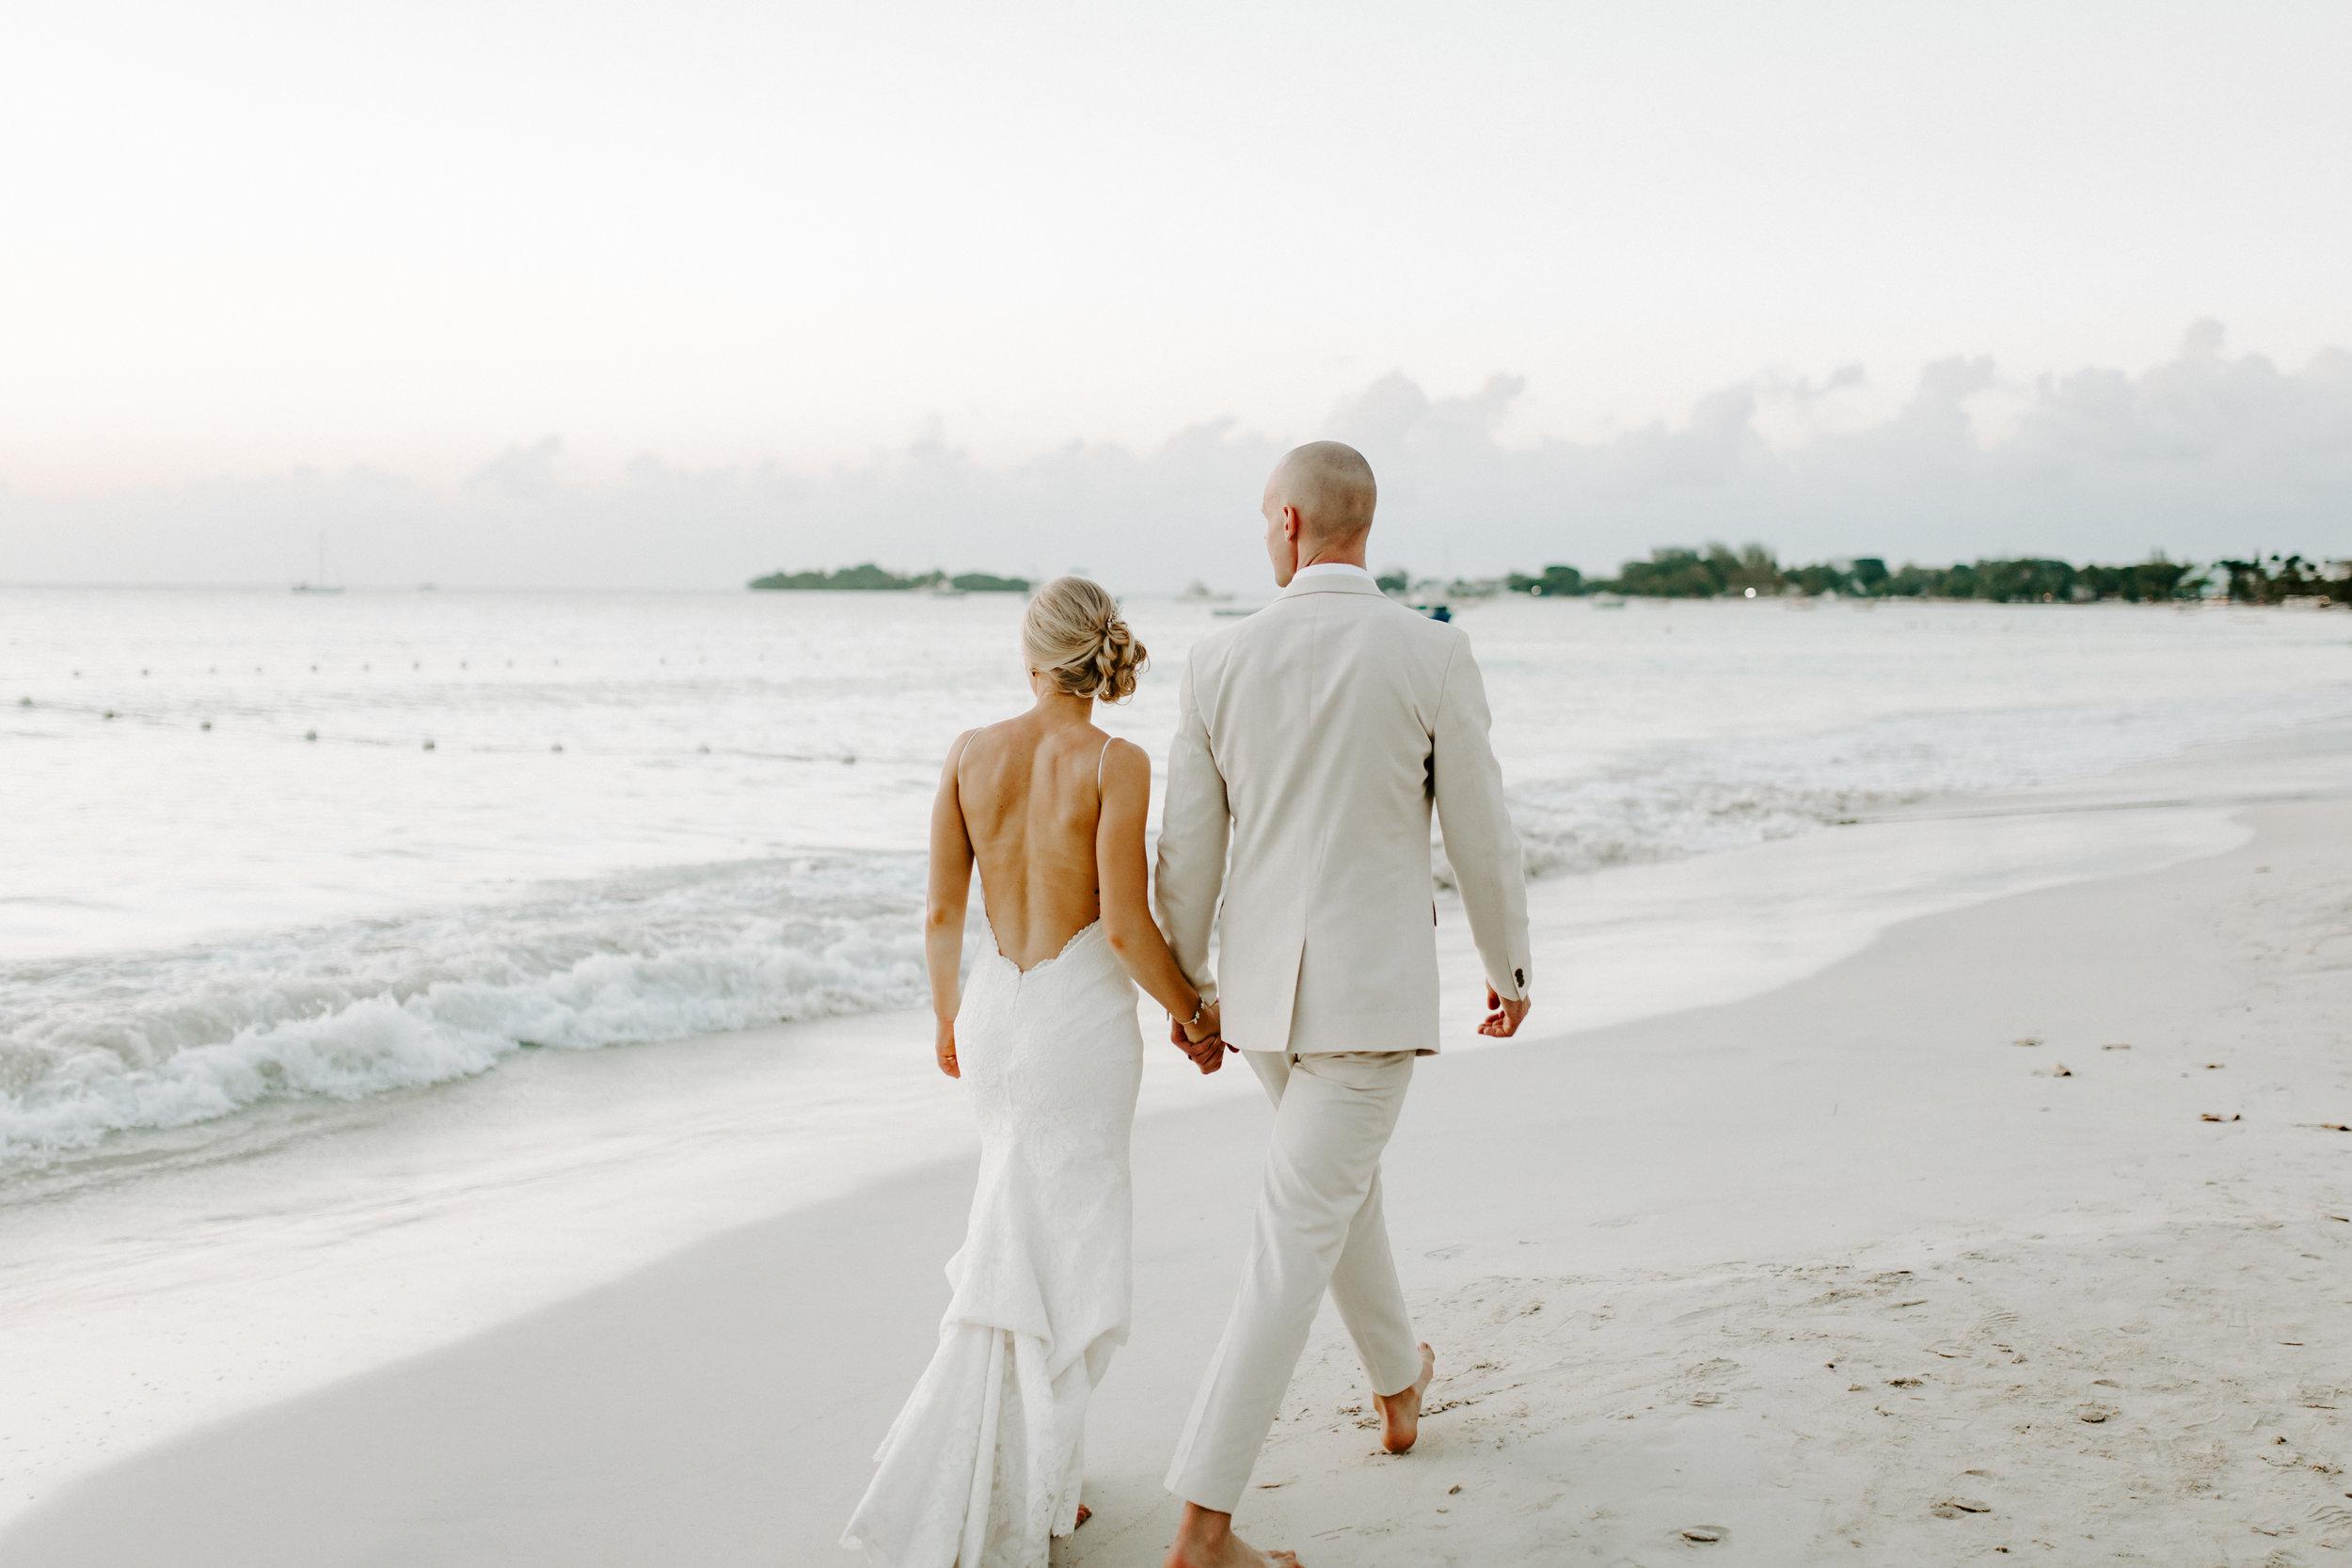 beach wedding, destination wedding, jamaican wedding, backless dress, backless wedding dress, katie may, katie may bridal, define fettle